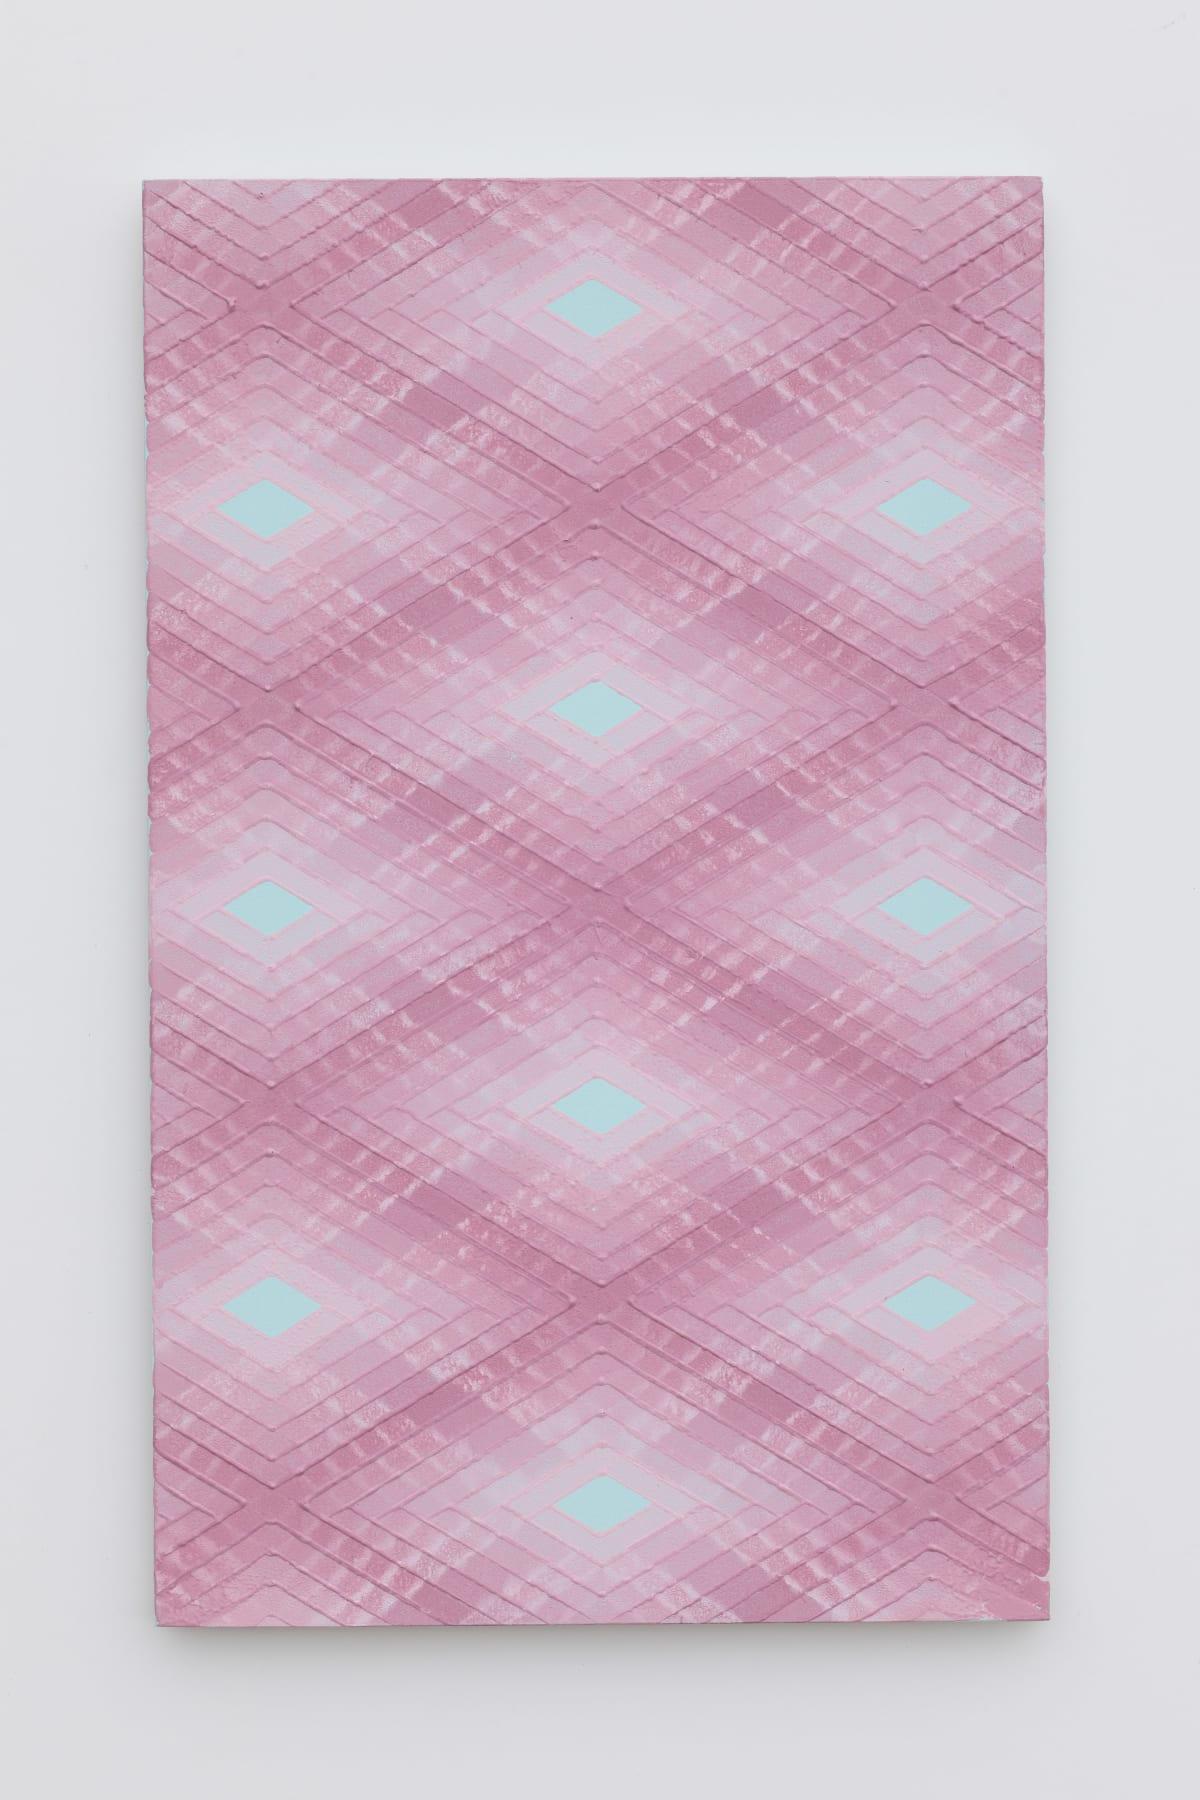 Will Cruickshank, Pink on turquoise 2, 2019